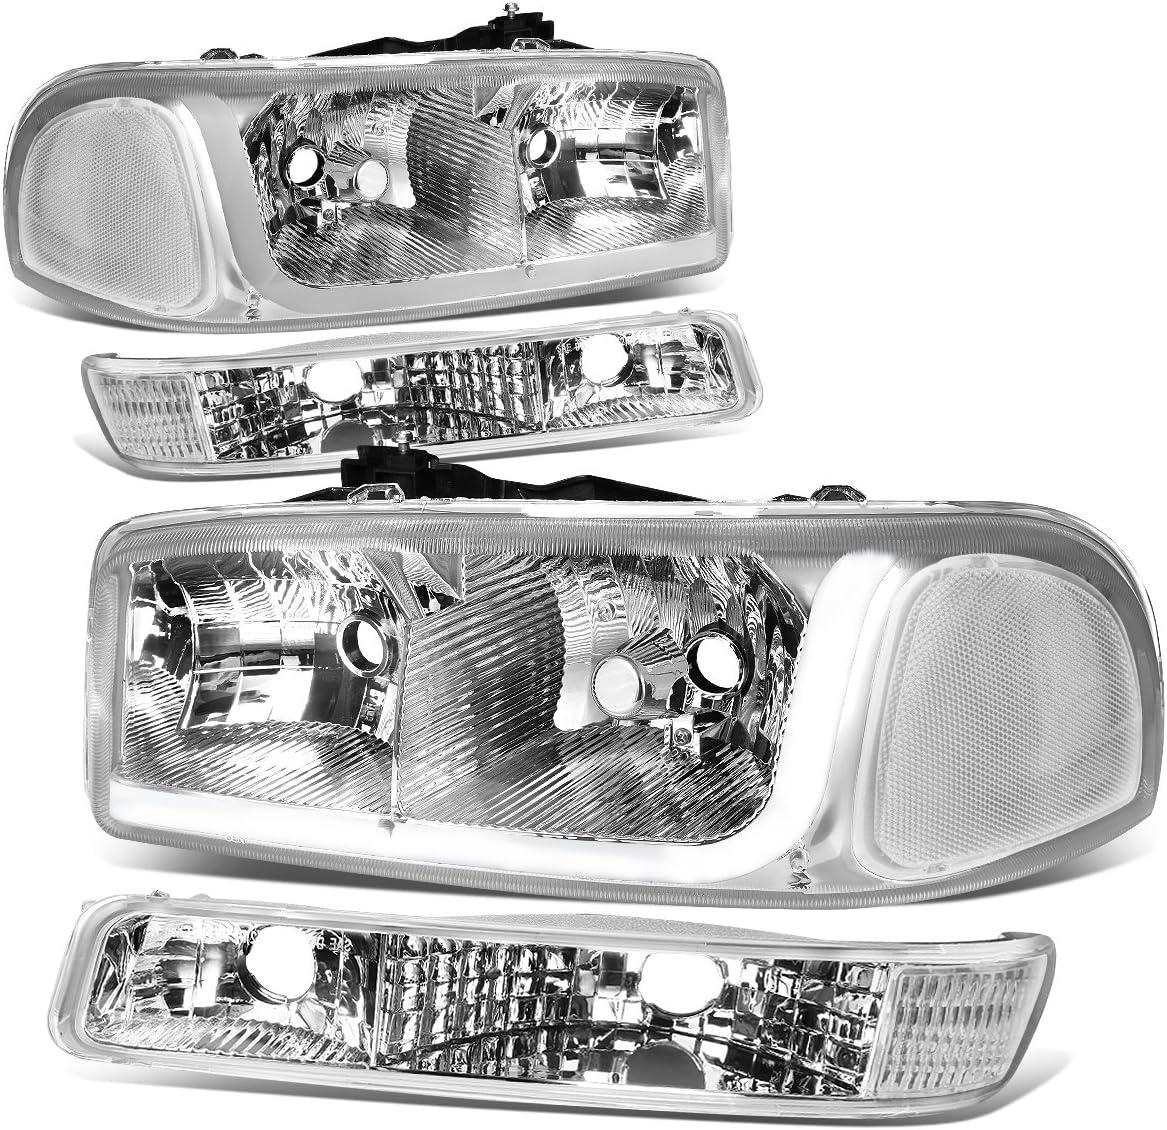 Replacement for 99-07 GMC Sierra Pair 00-06 Yukon LED DRL Black Housing Clear Corner Headlight w//Bumper Lights//Lamps